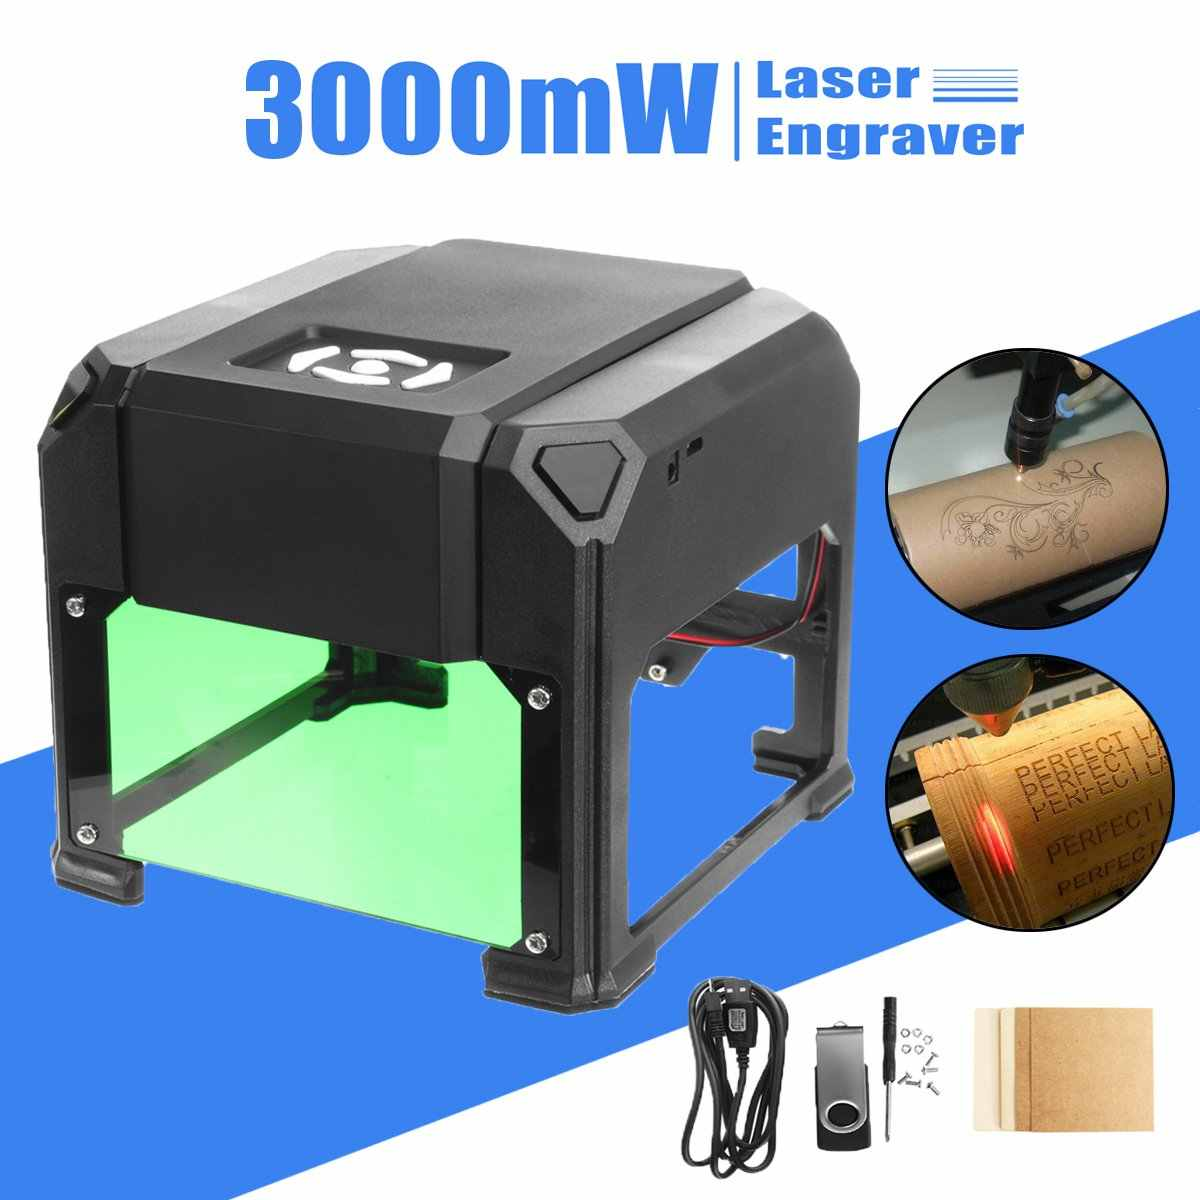 Mini USB 3000 mW CNC máquina de grabado láser 110V220V enrutador de madera de escritorio de grabador casero DIY/cortador/impresora para sistema operativo WIN/Mac